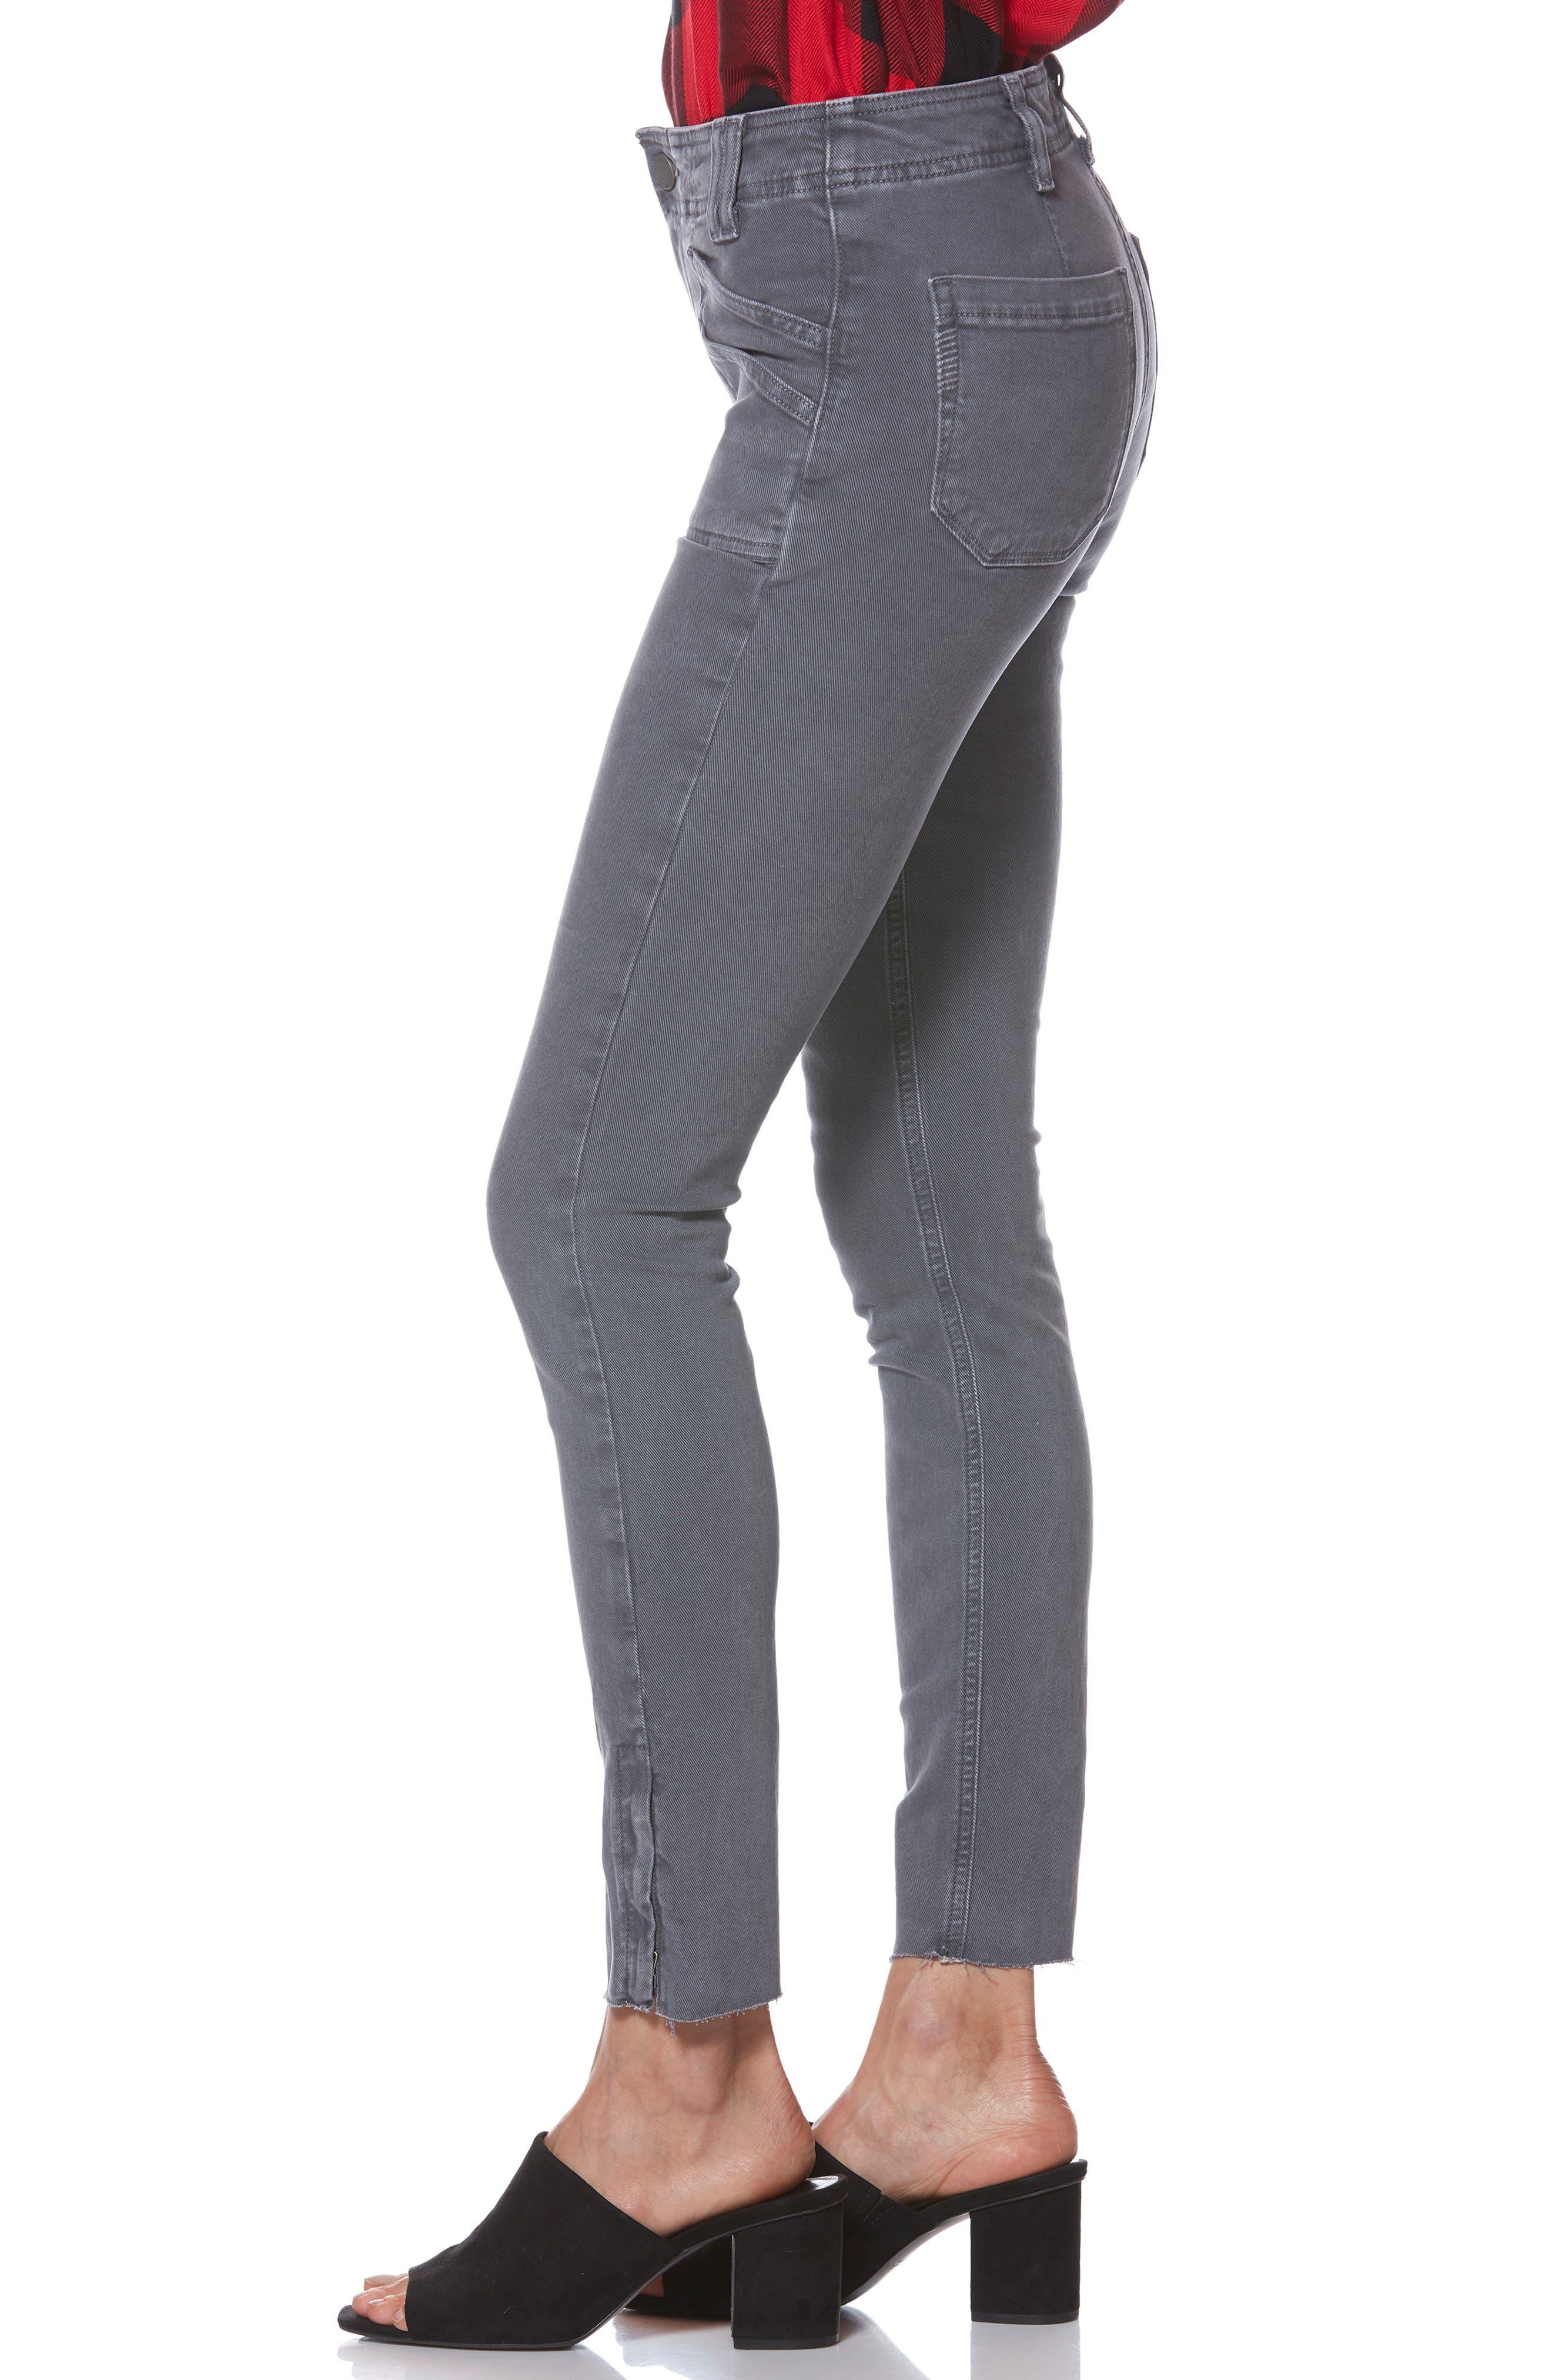 Hoxton Utilitarian High Waist Ankle Skinny Jeans,                             Alternate thumbnail 3, color,                             VINTAGE TORNADO